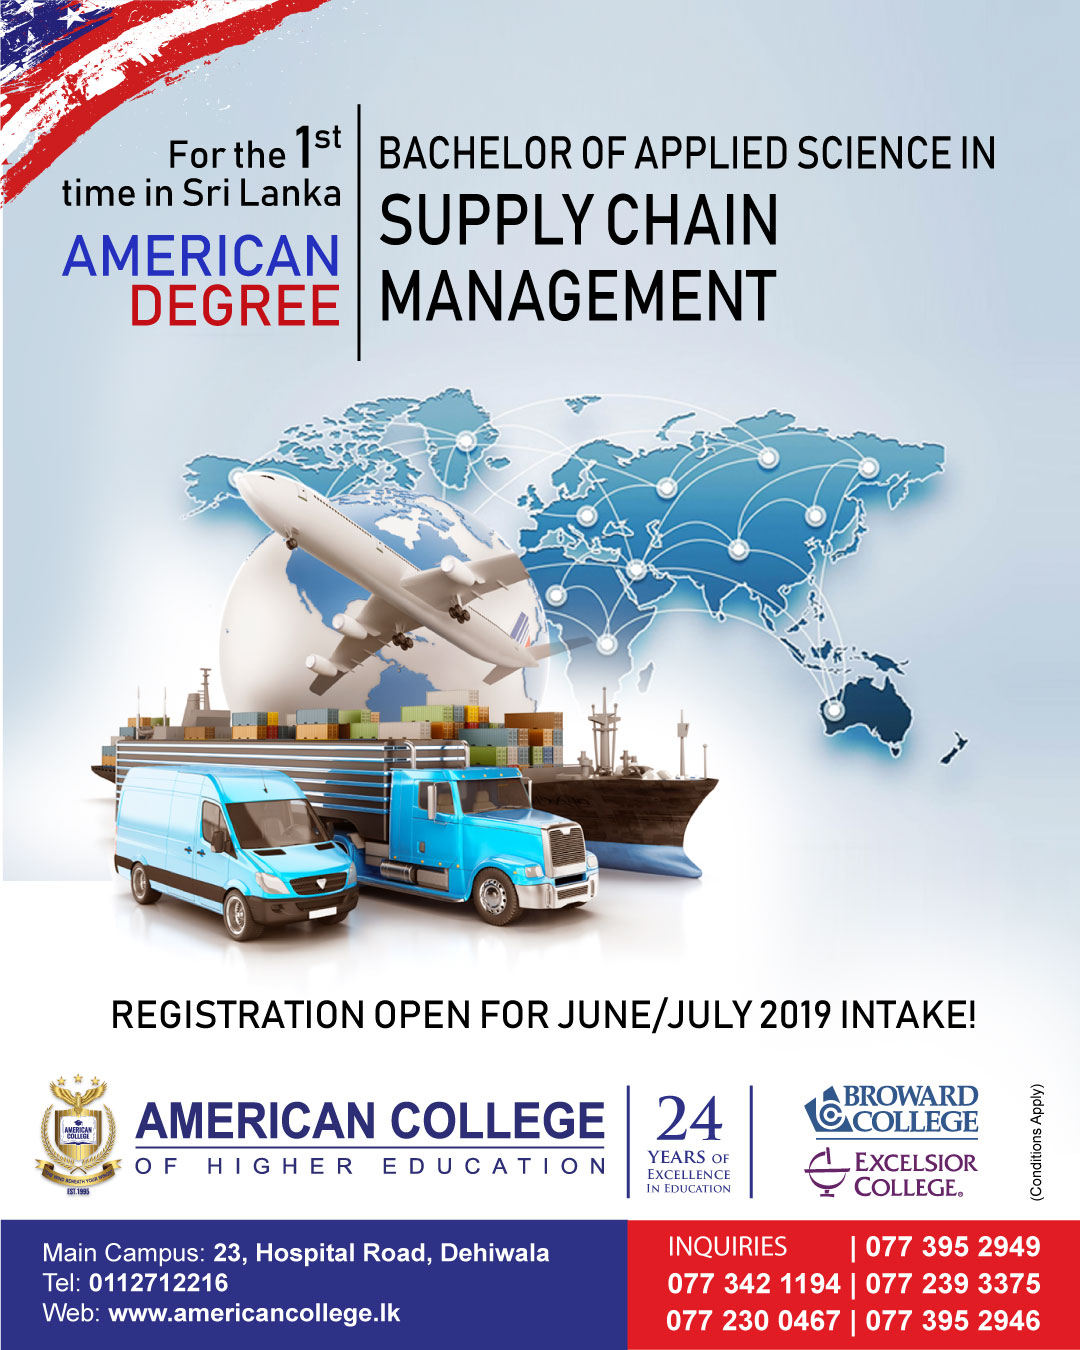 www.americancollege.lk